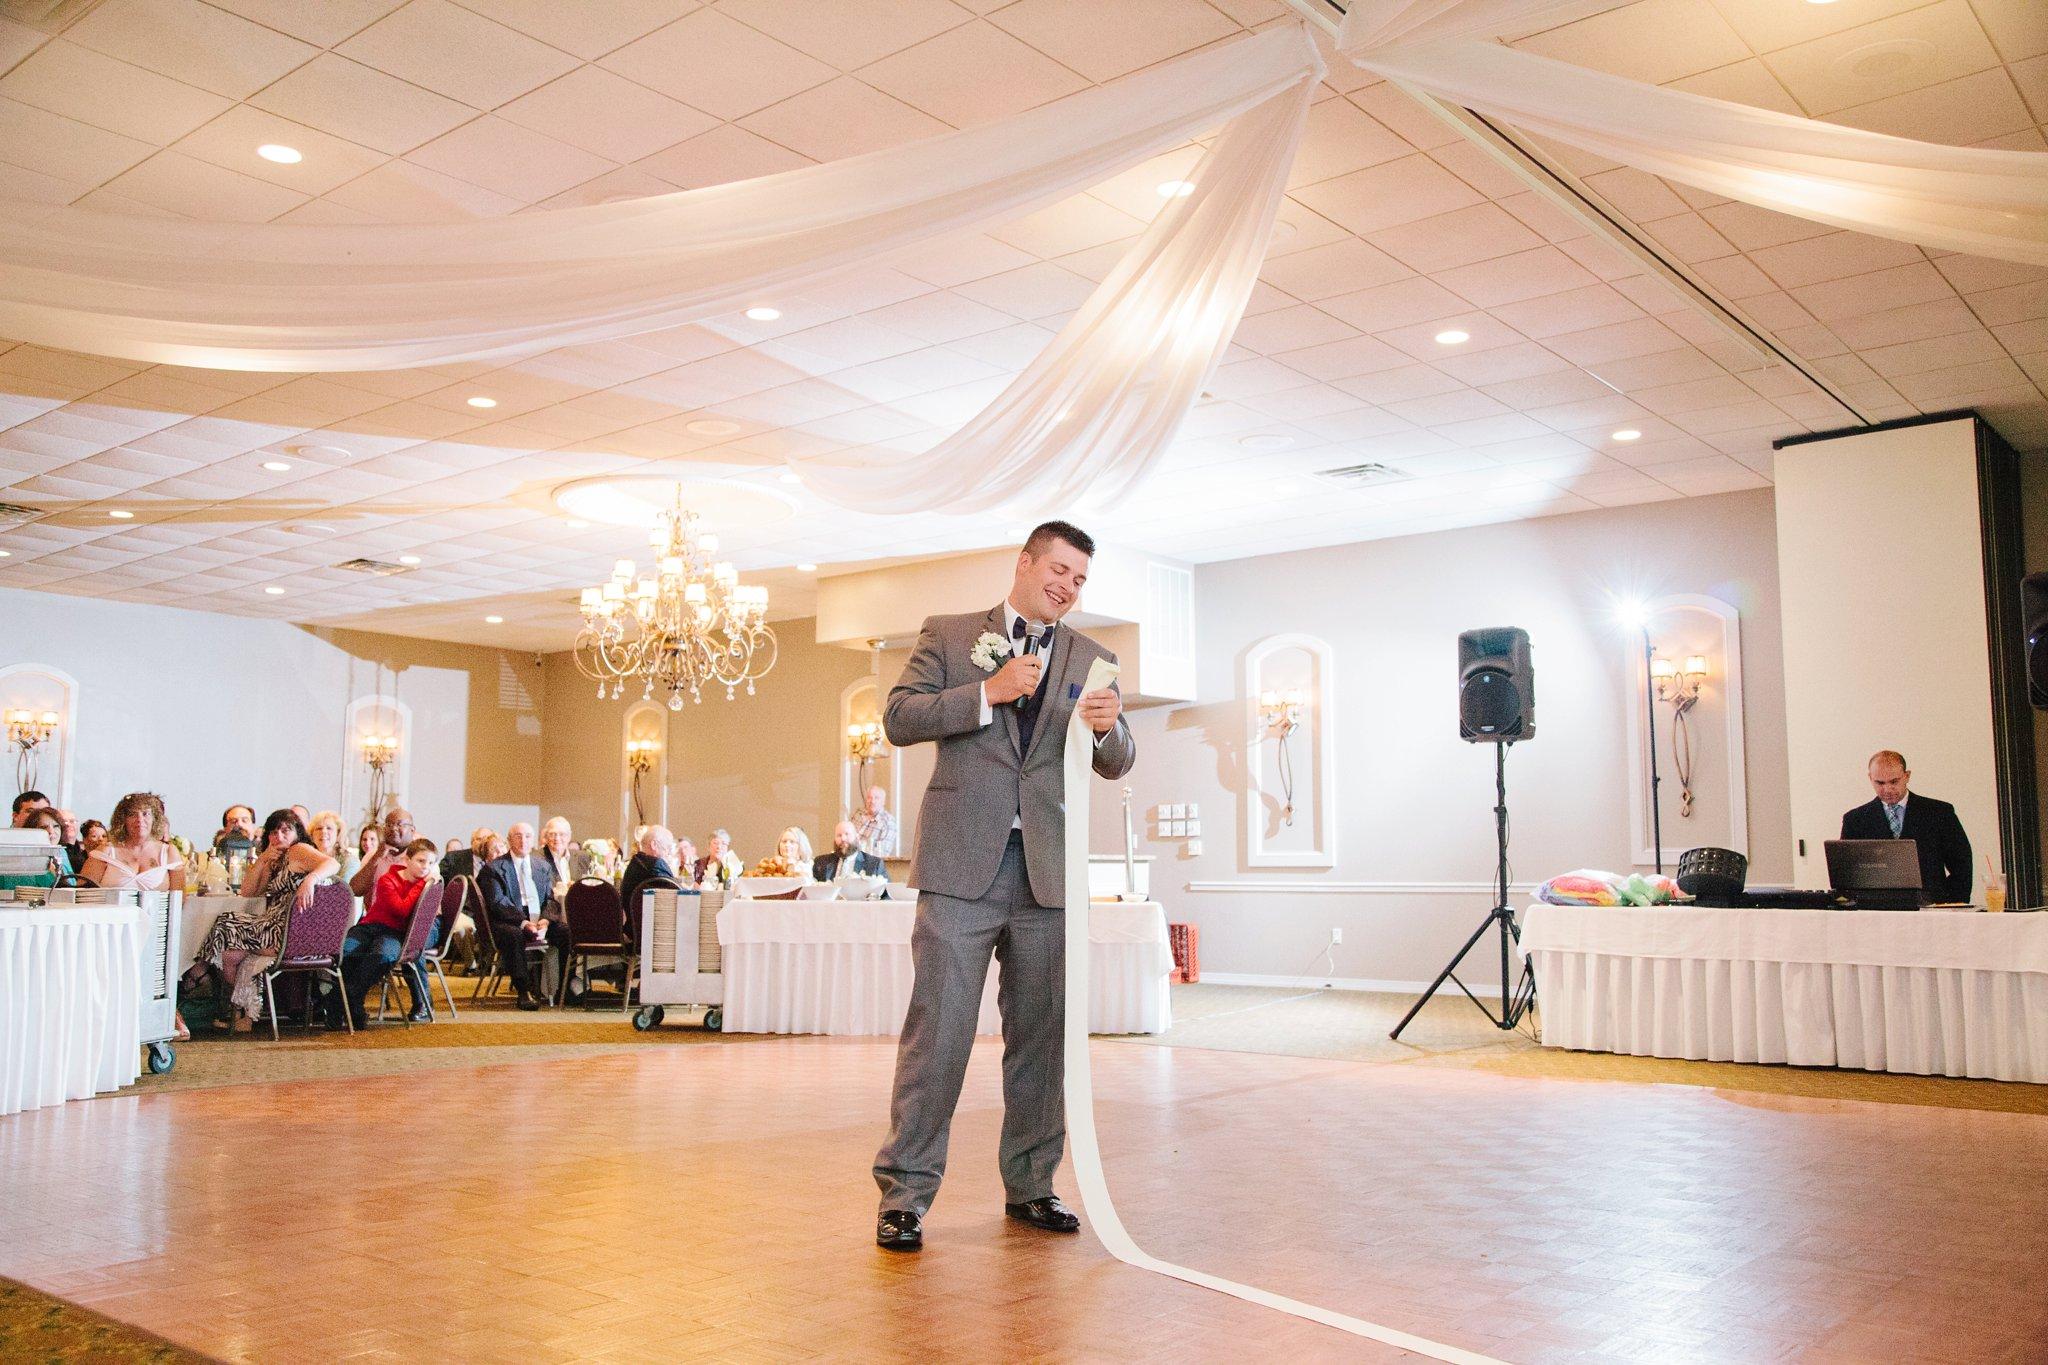 montdale_country_club_wedding_photos_photographer_scranton_pa7943.jpg